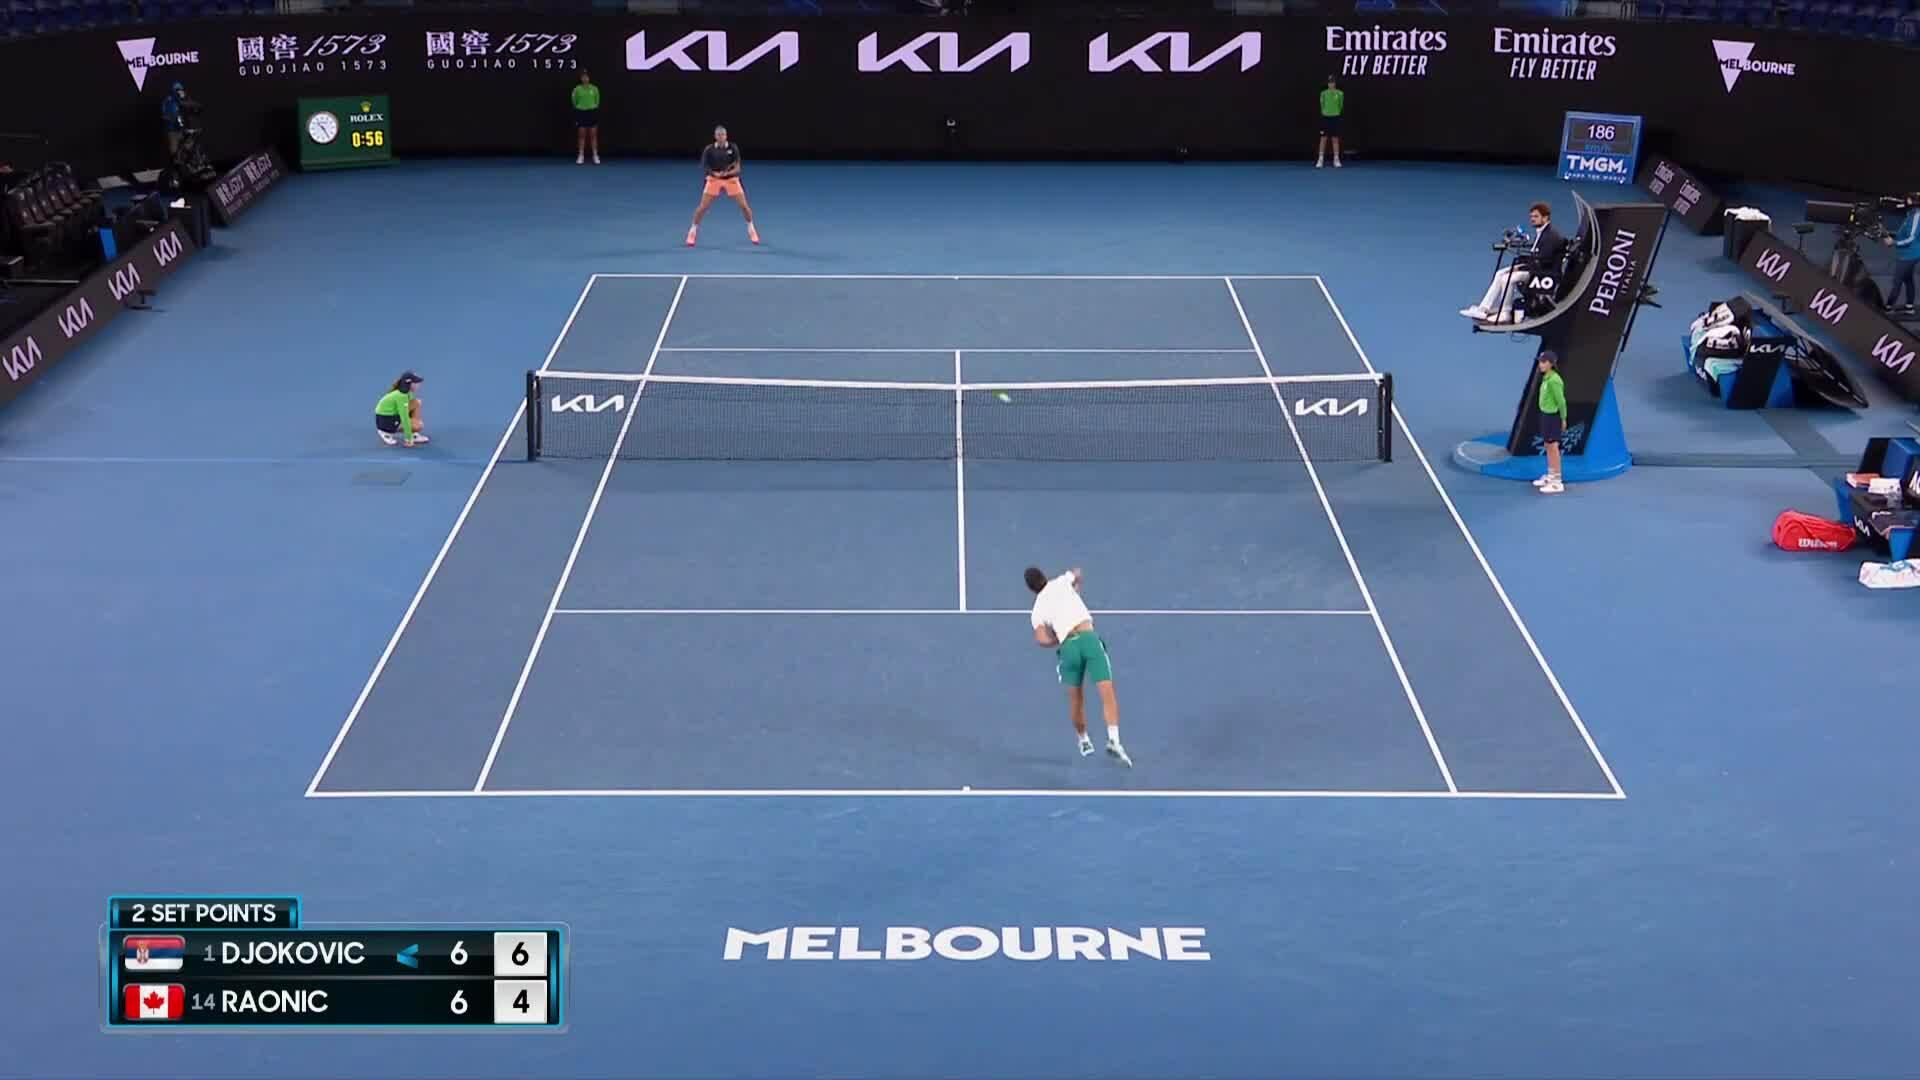 Djokovic 3-1 Milos Raonic